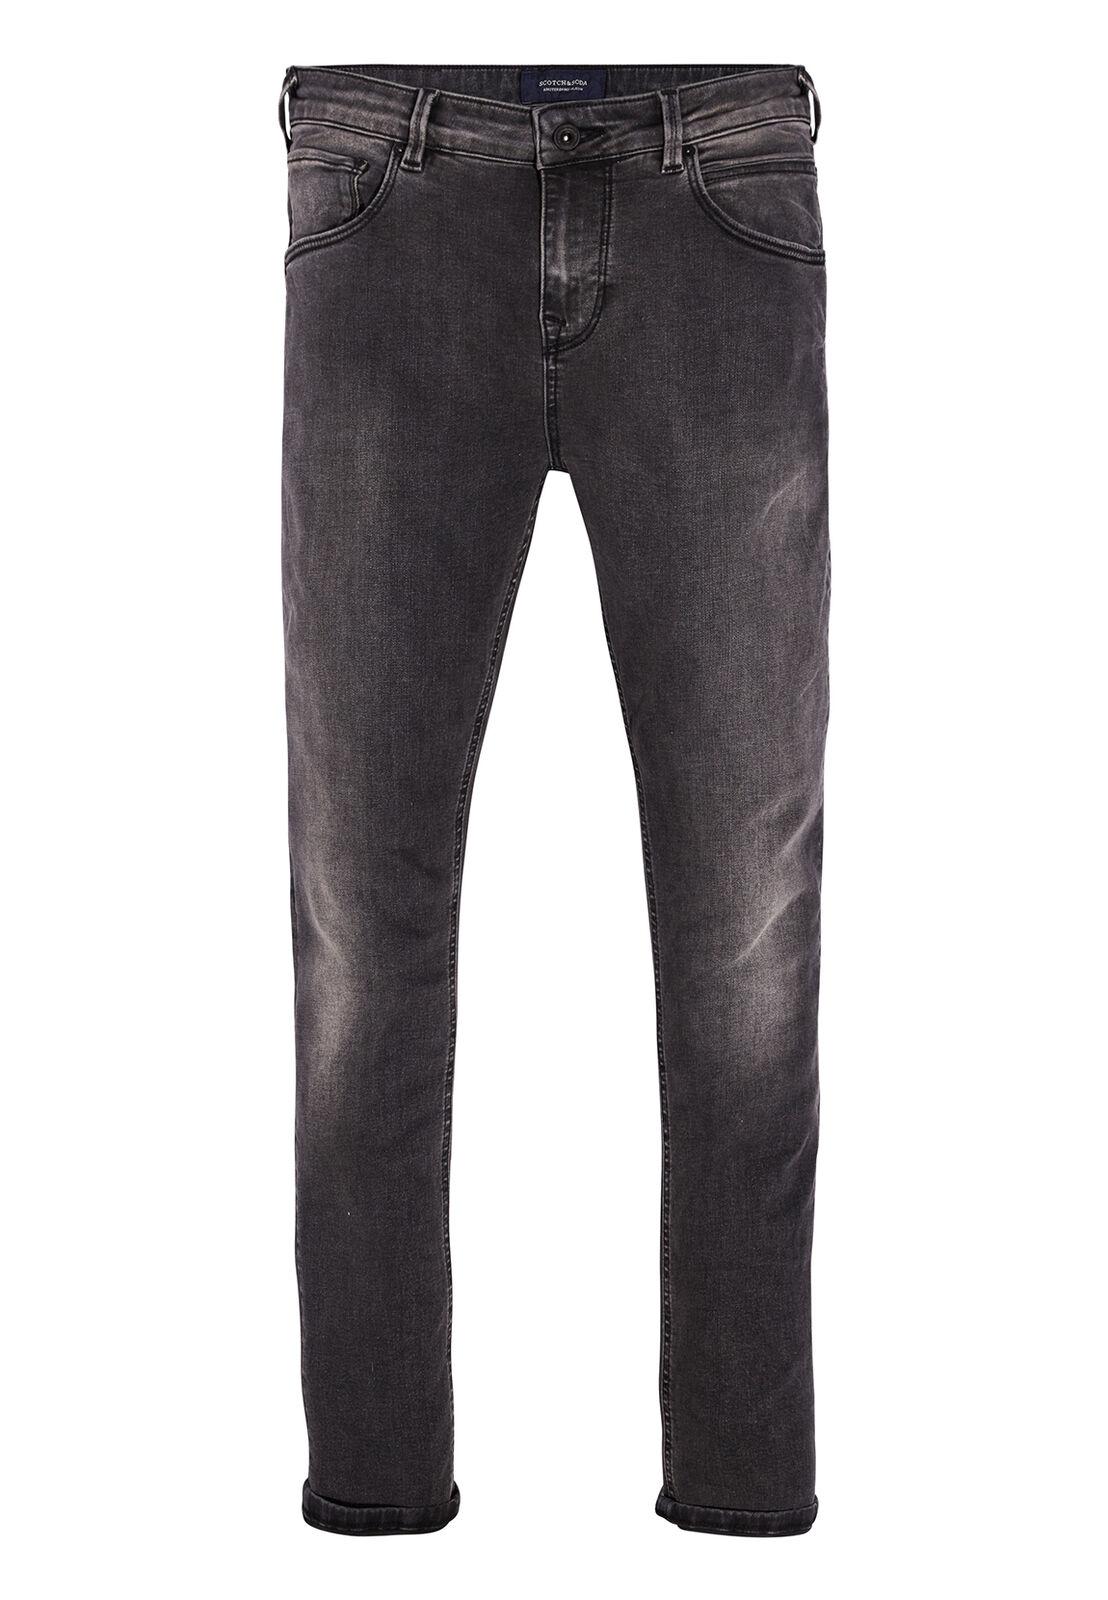 Scotch & Soda Jeans Men Dart 141171 Dark Grey 1809